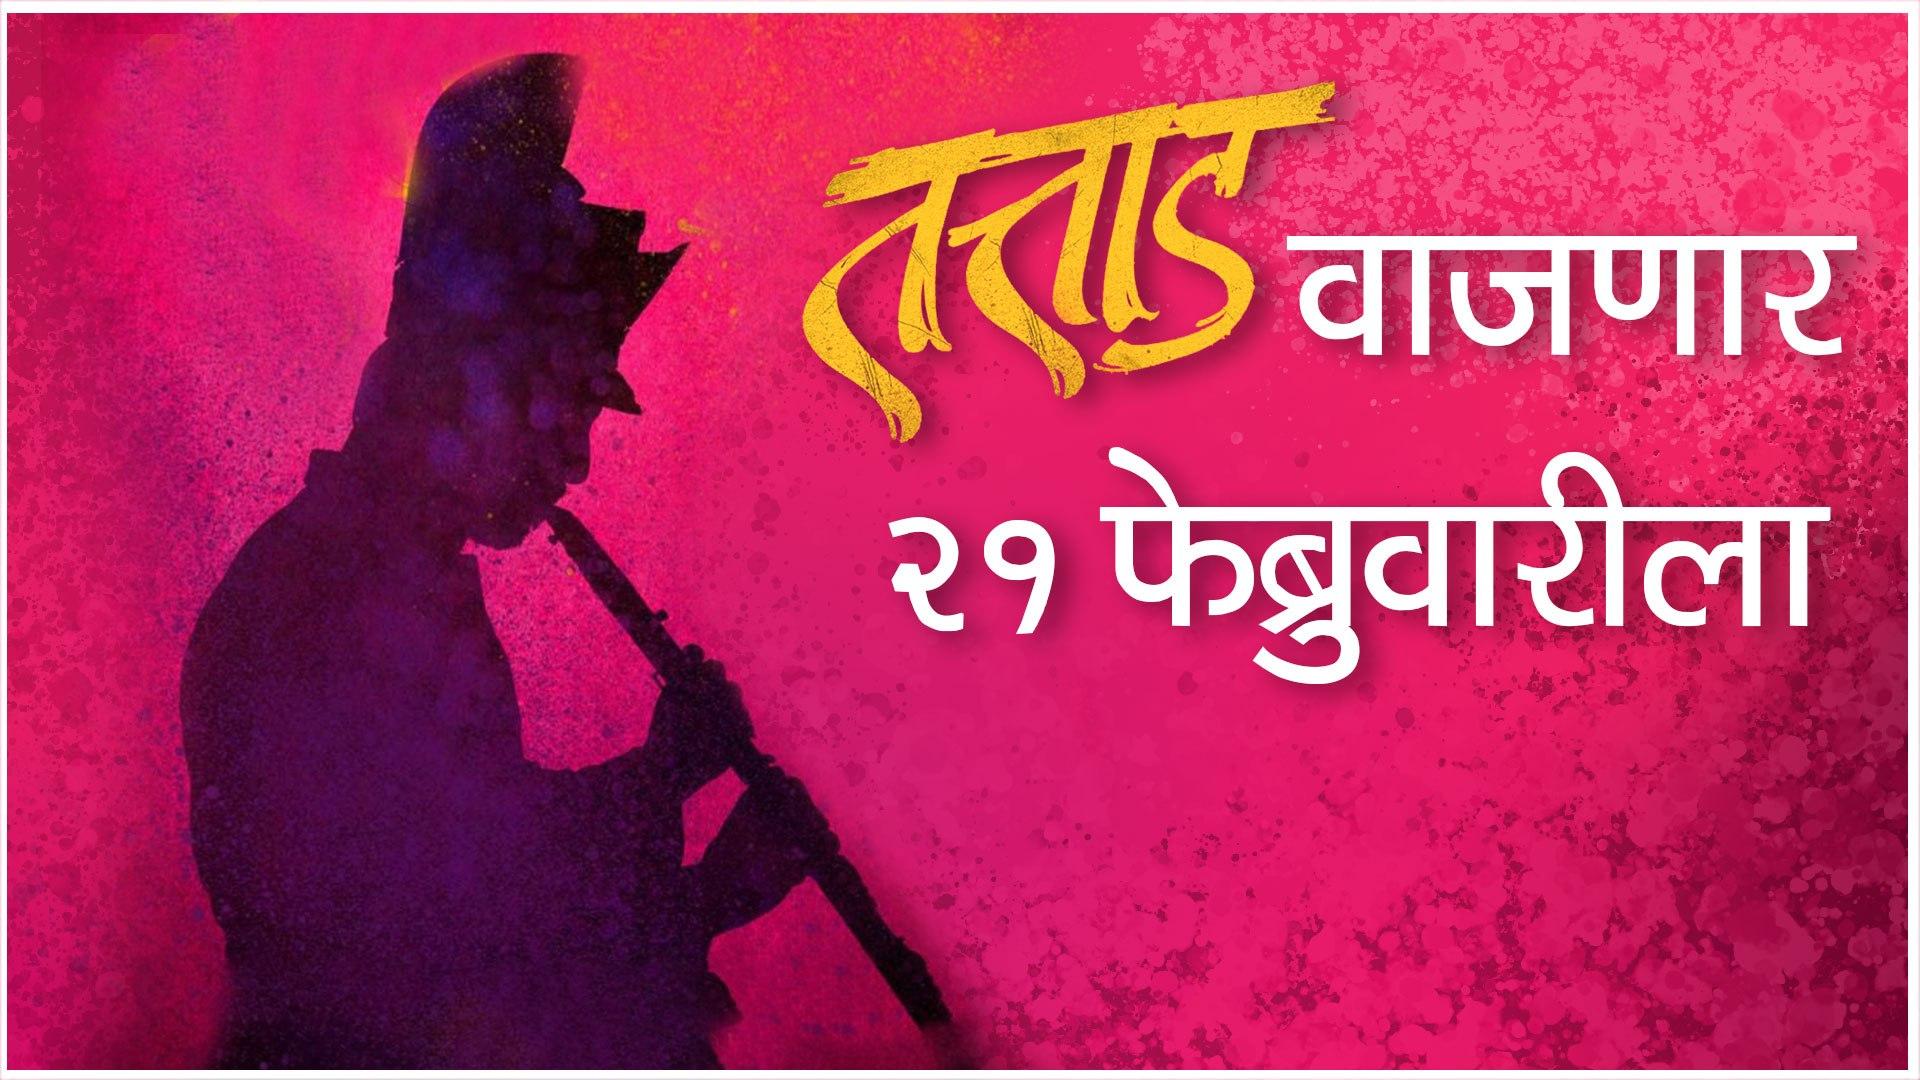 Tattad | तत्ताड वाजणार २१ फेब्रुवारीला | Upcoming marathi movie 2020